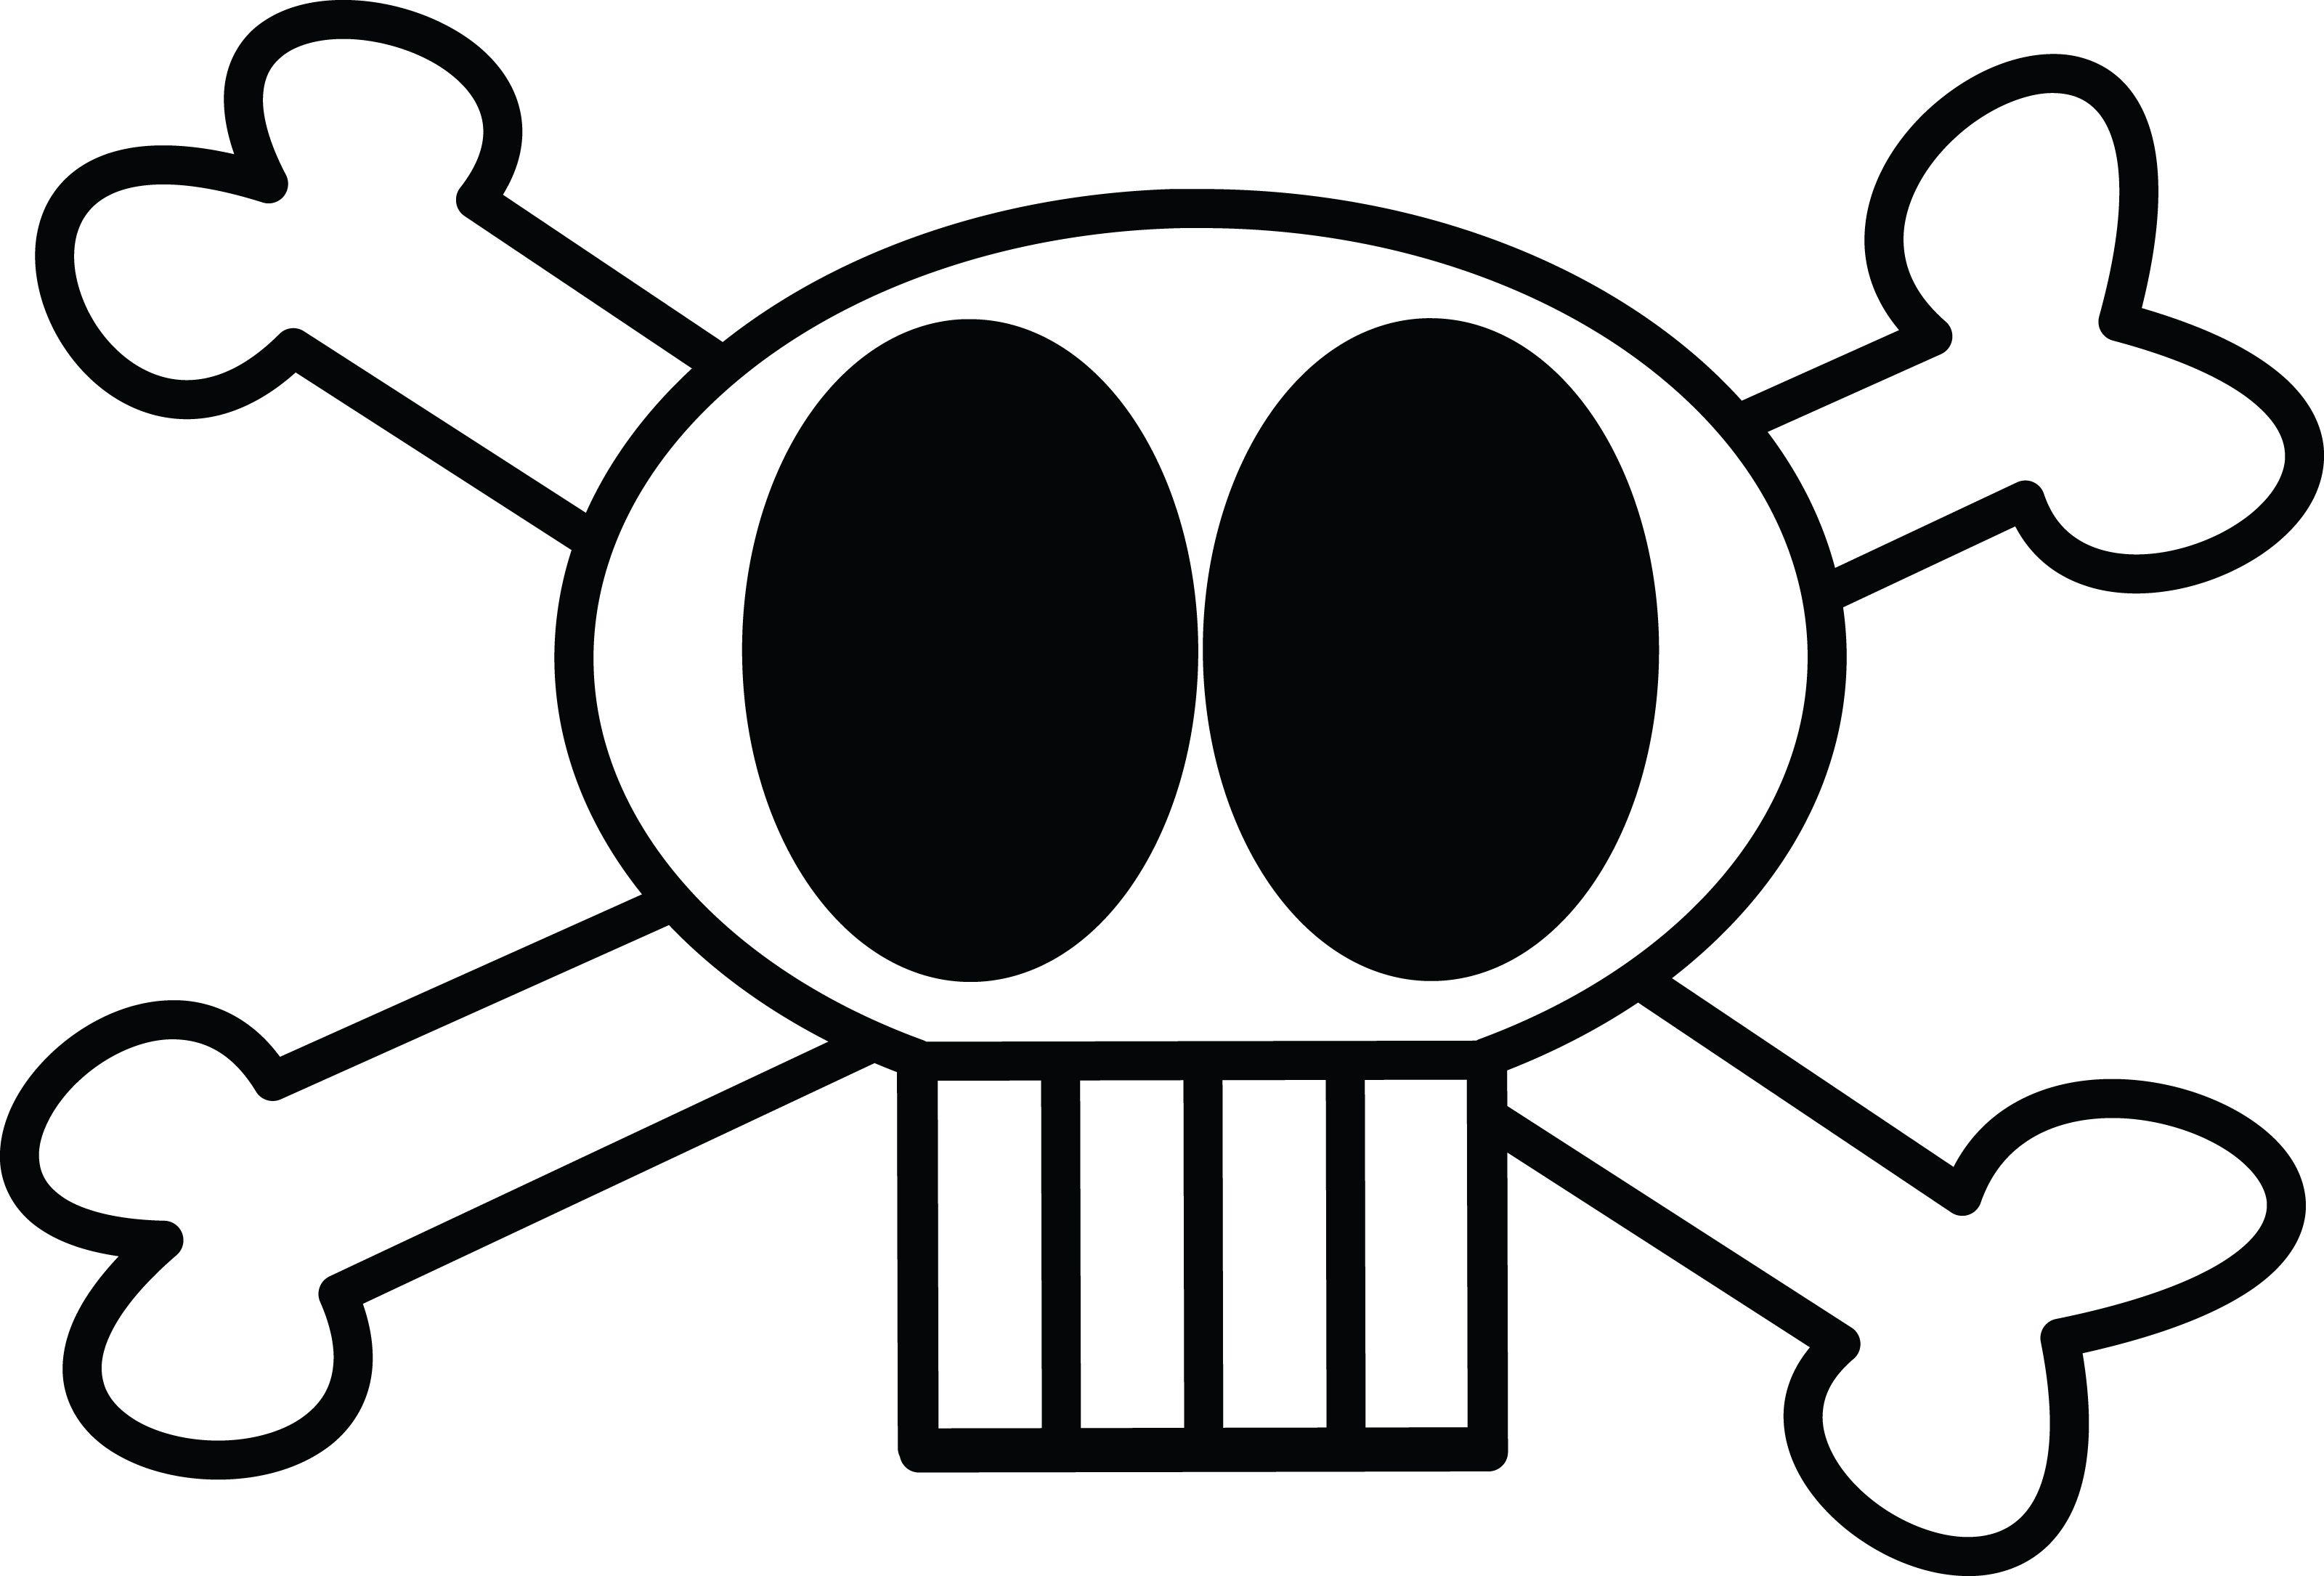 Skull And Crossbones clipart - Skull, Font, Silhouette, transparent clip art